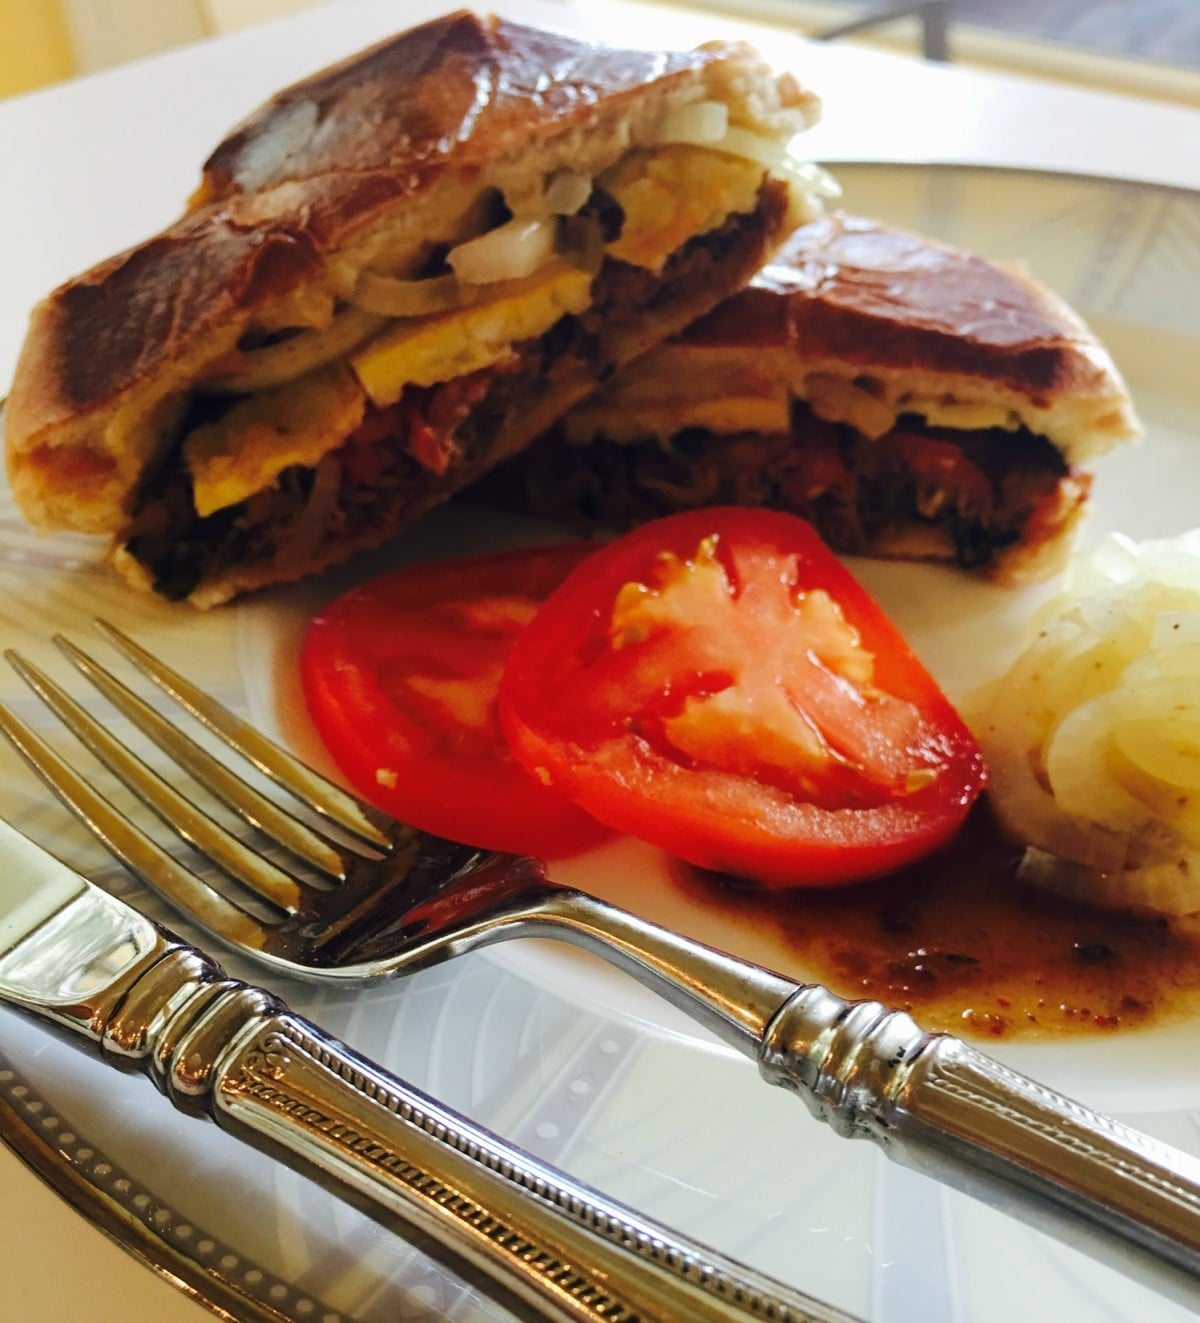 No street food hits the right spot like the karaara bun kebab